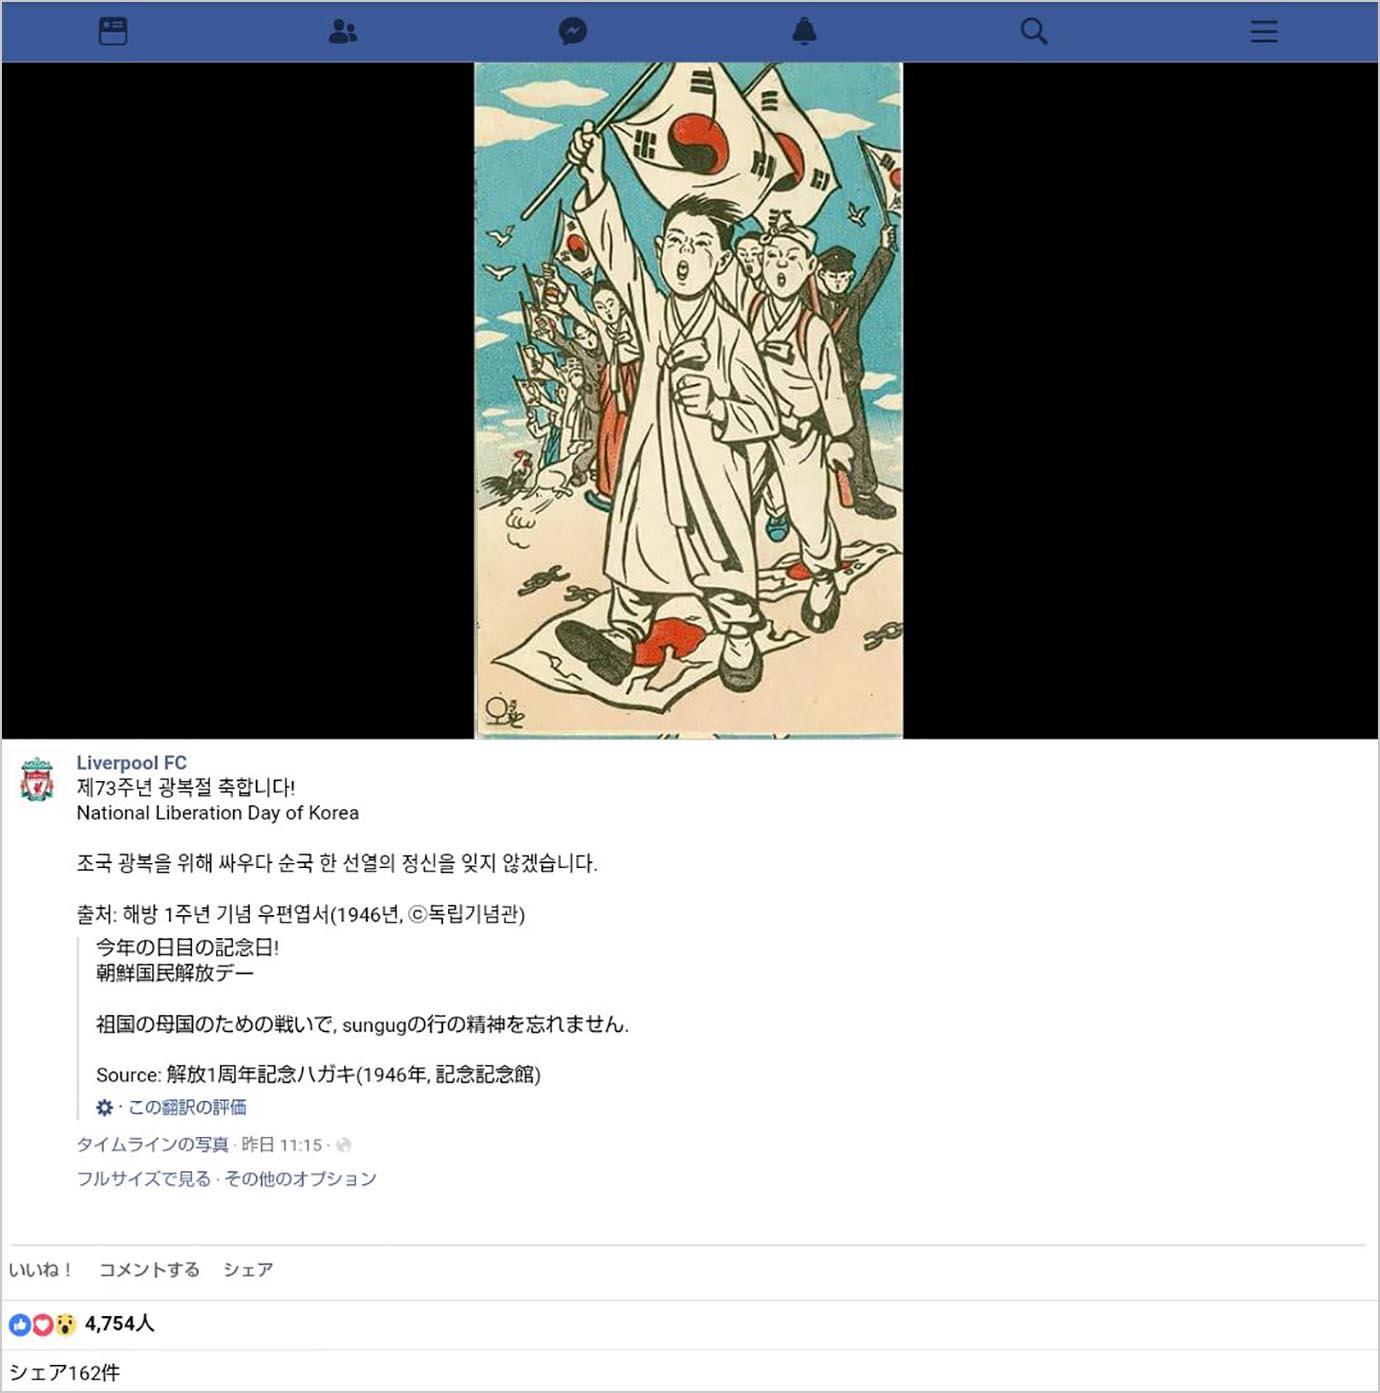 liverpool-fc-in-korea2